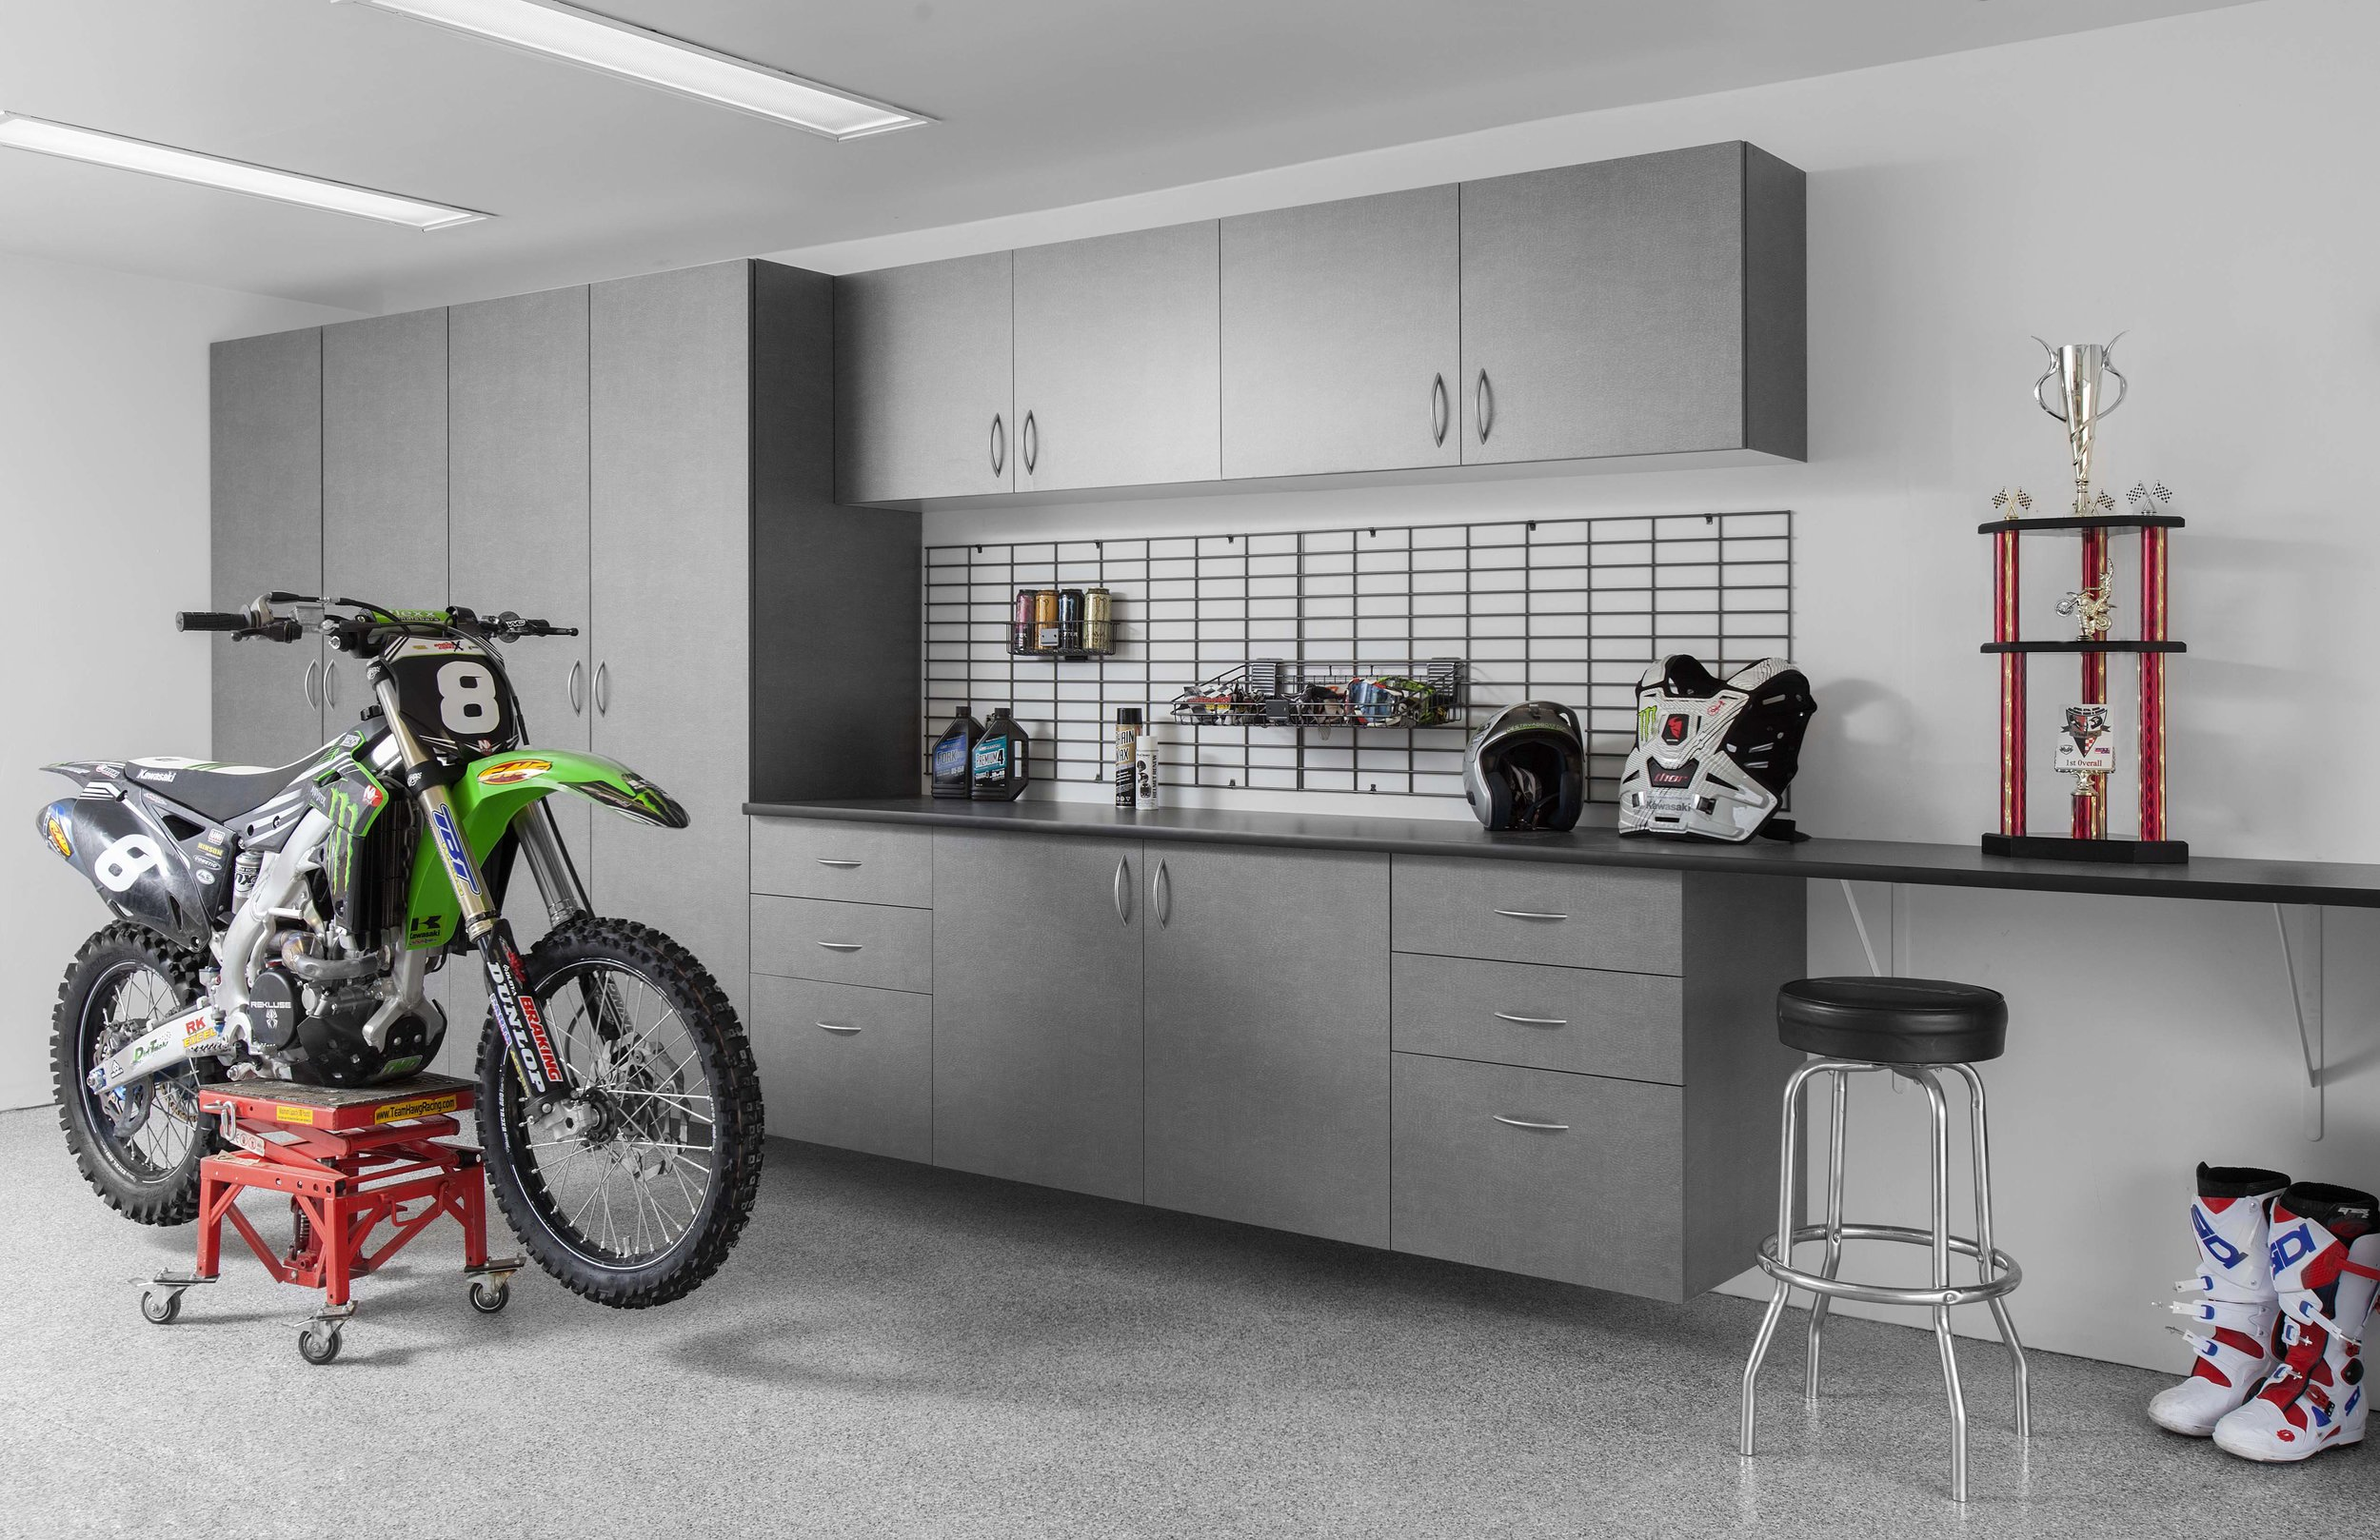 Pewter Cabinets-Ebony Star Workbench-Silverado Floor-Dirt Bike-Abbott-May 2013.jpg